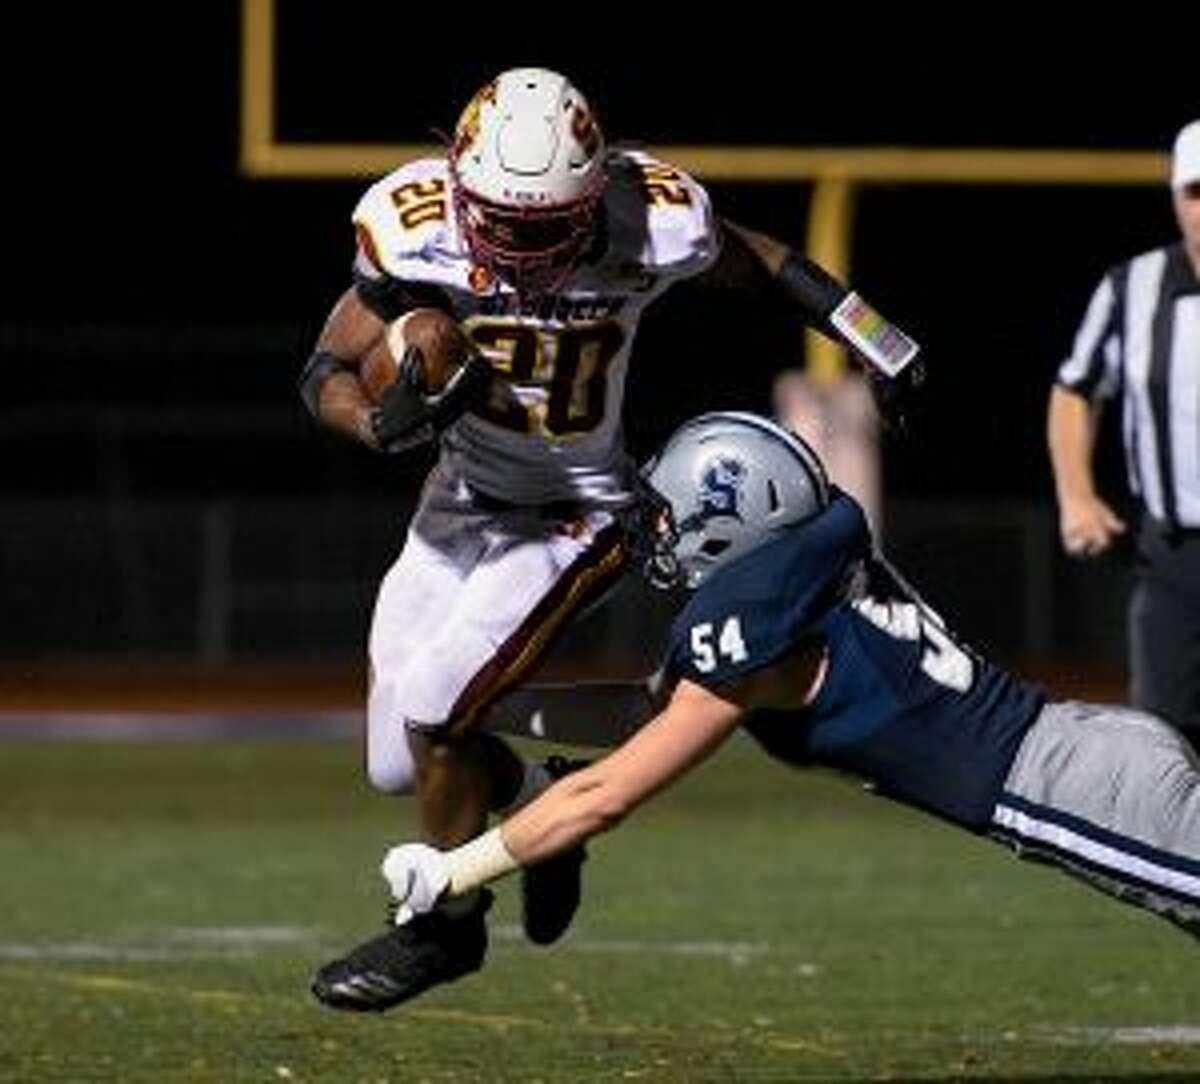 Jaden Shirden ran for 166 yards and a third-quarter touchdown. - David G. Whitham photos